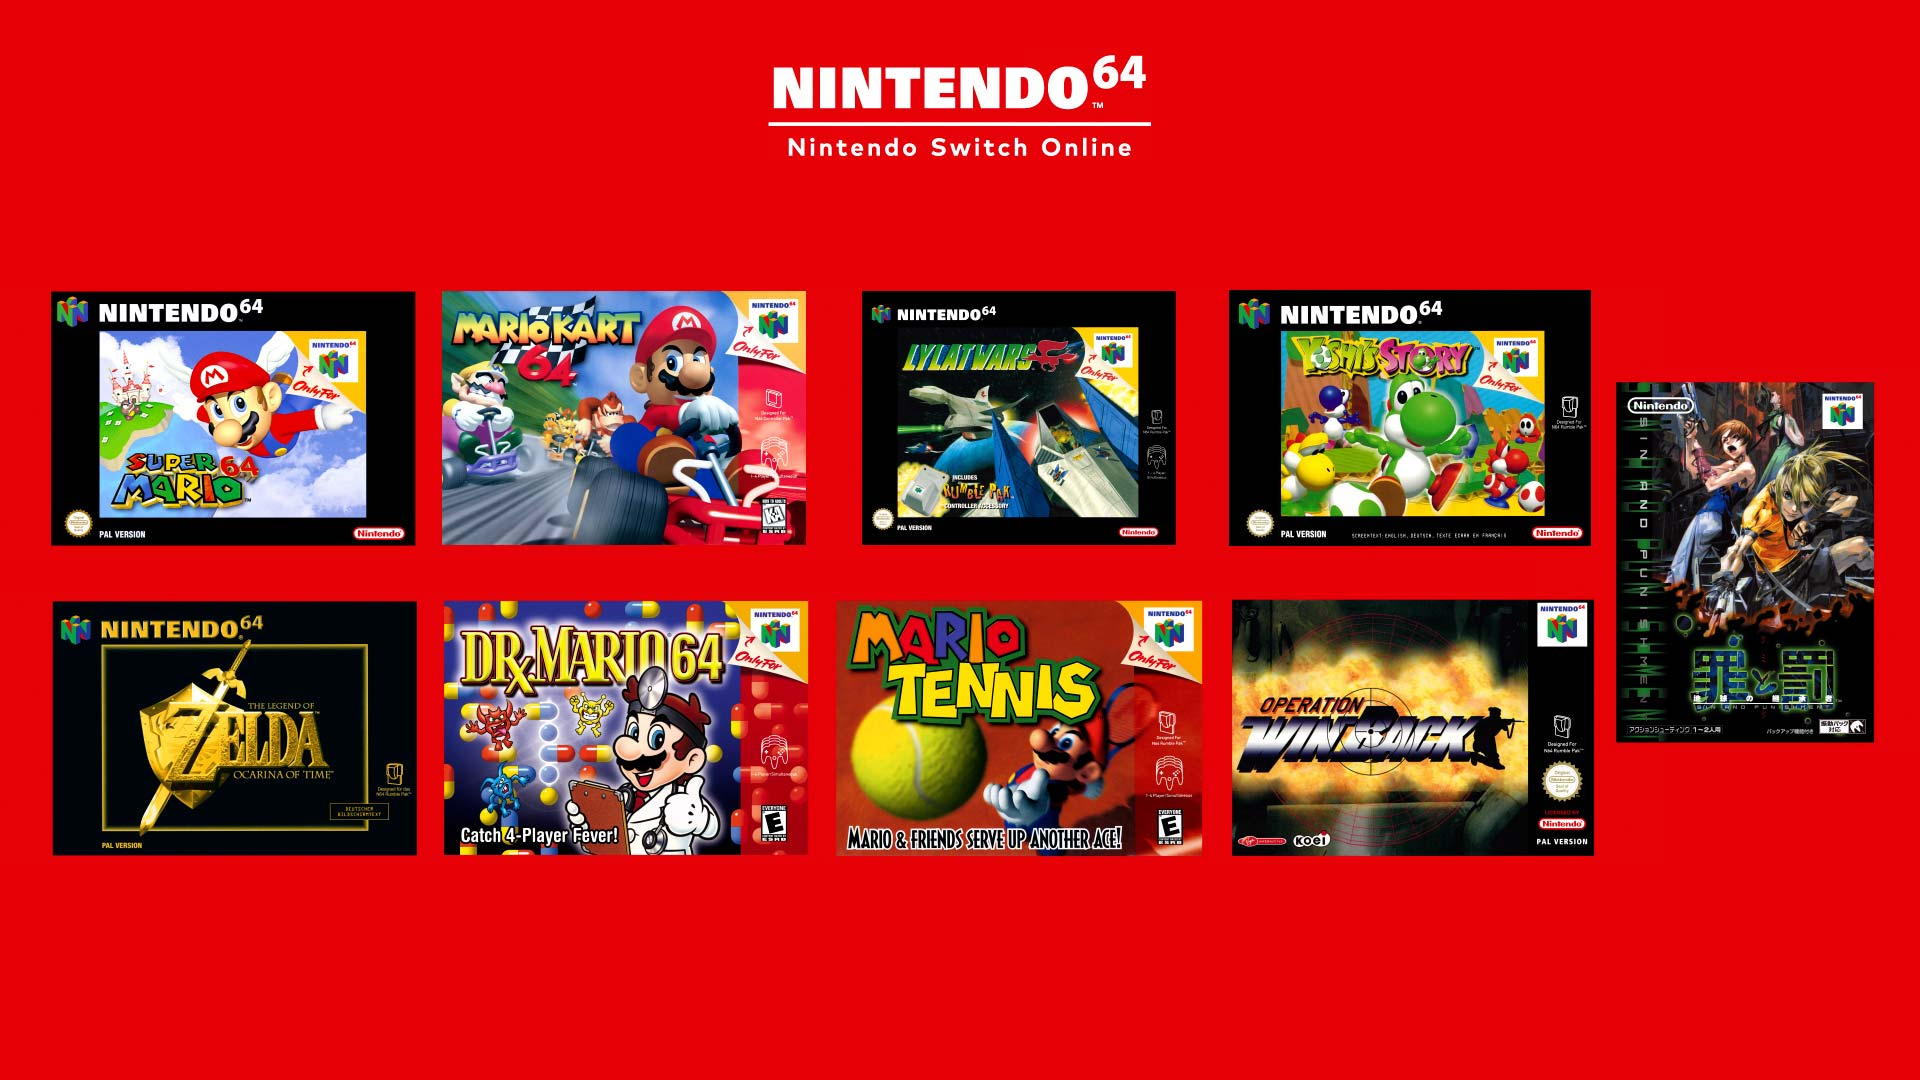 NSO Nintendo 64